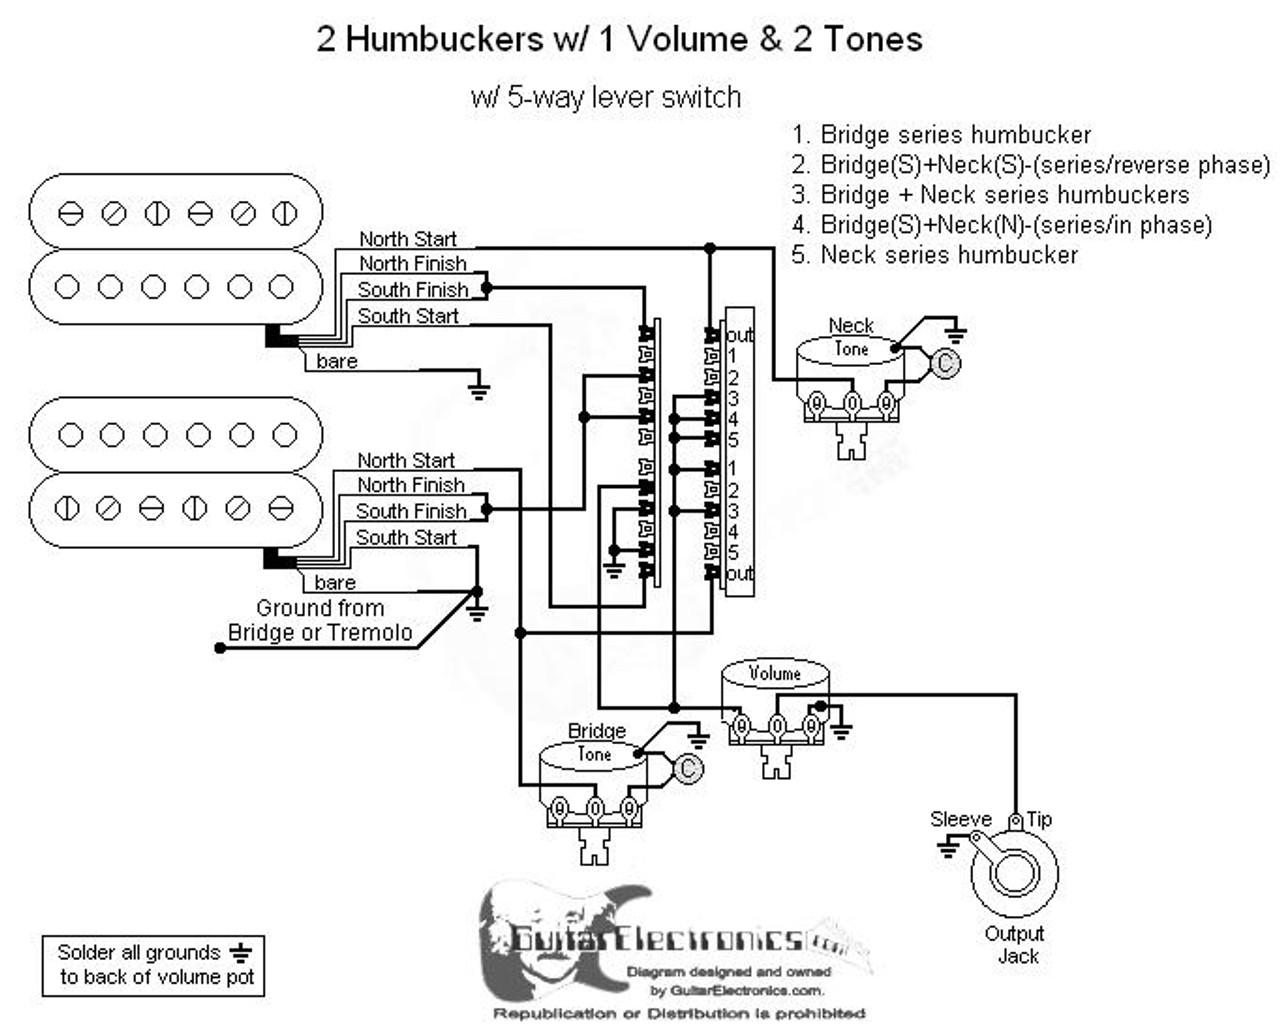 2 humbuckers 5 way lever switch 1 volume 2 tone 03 rh guitarelectronics com